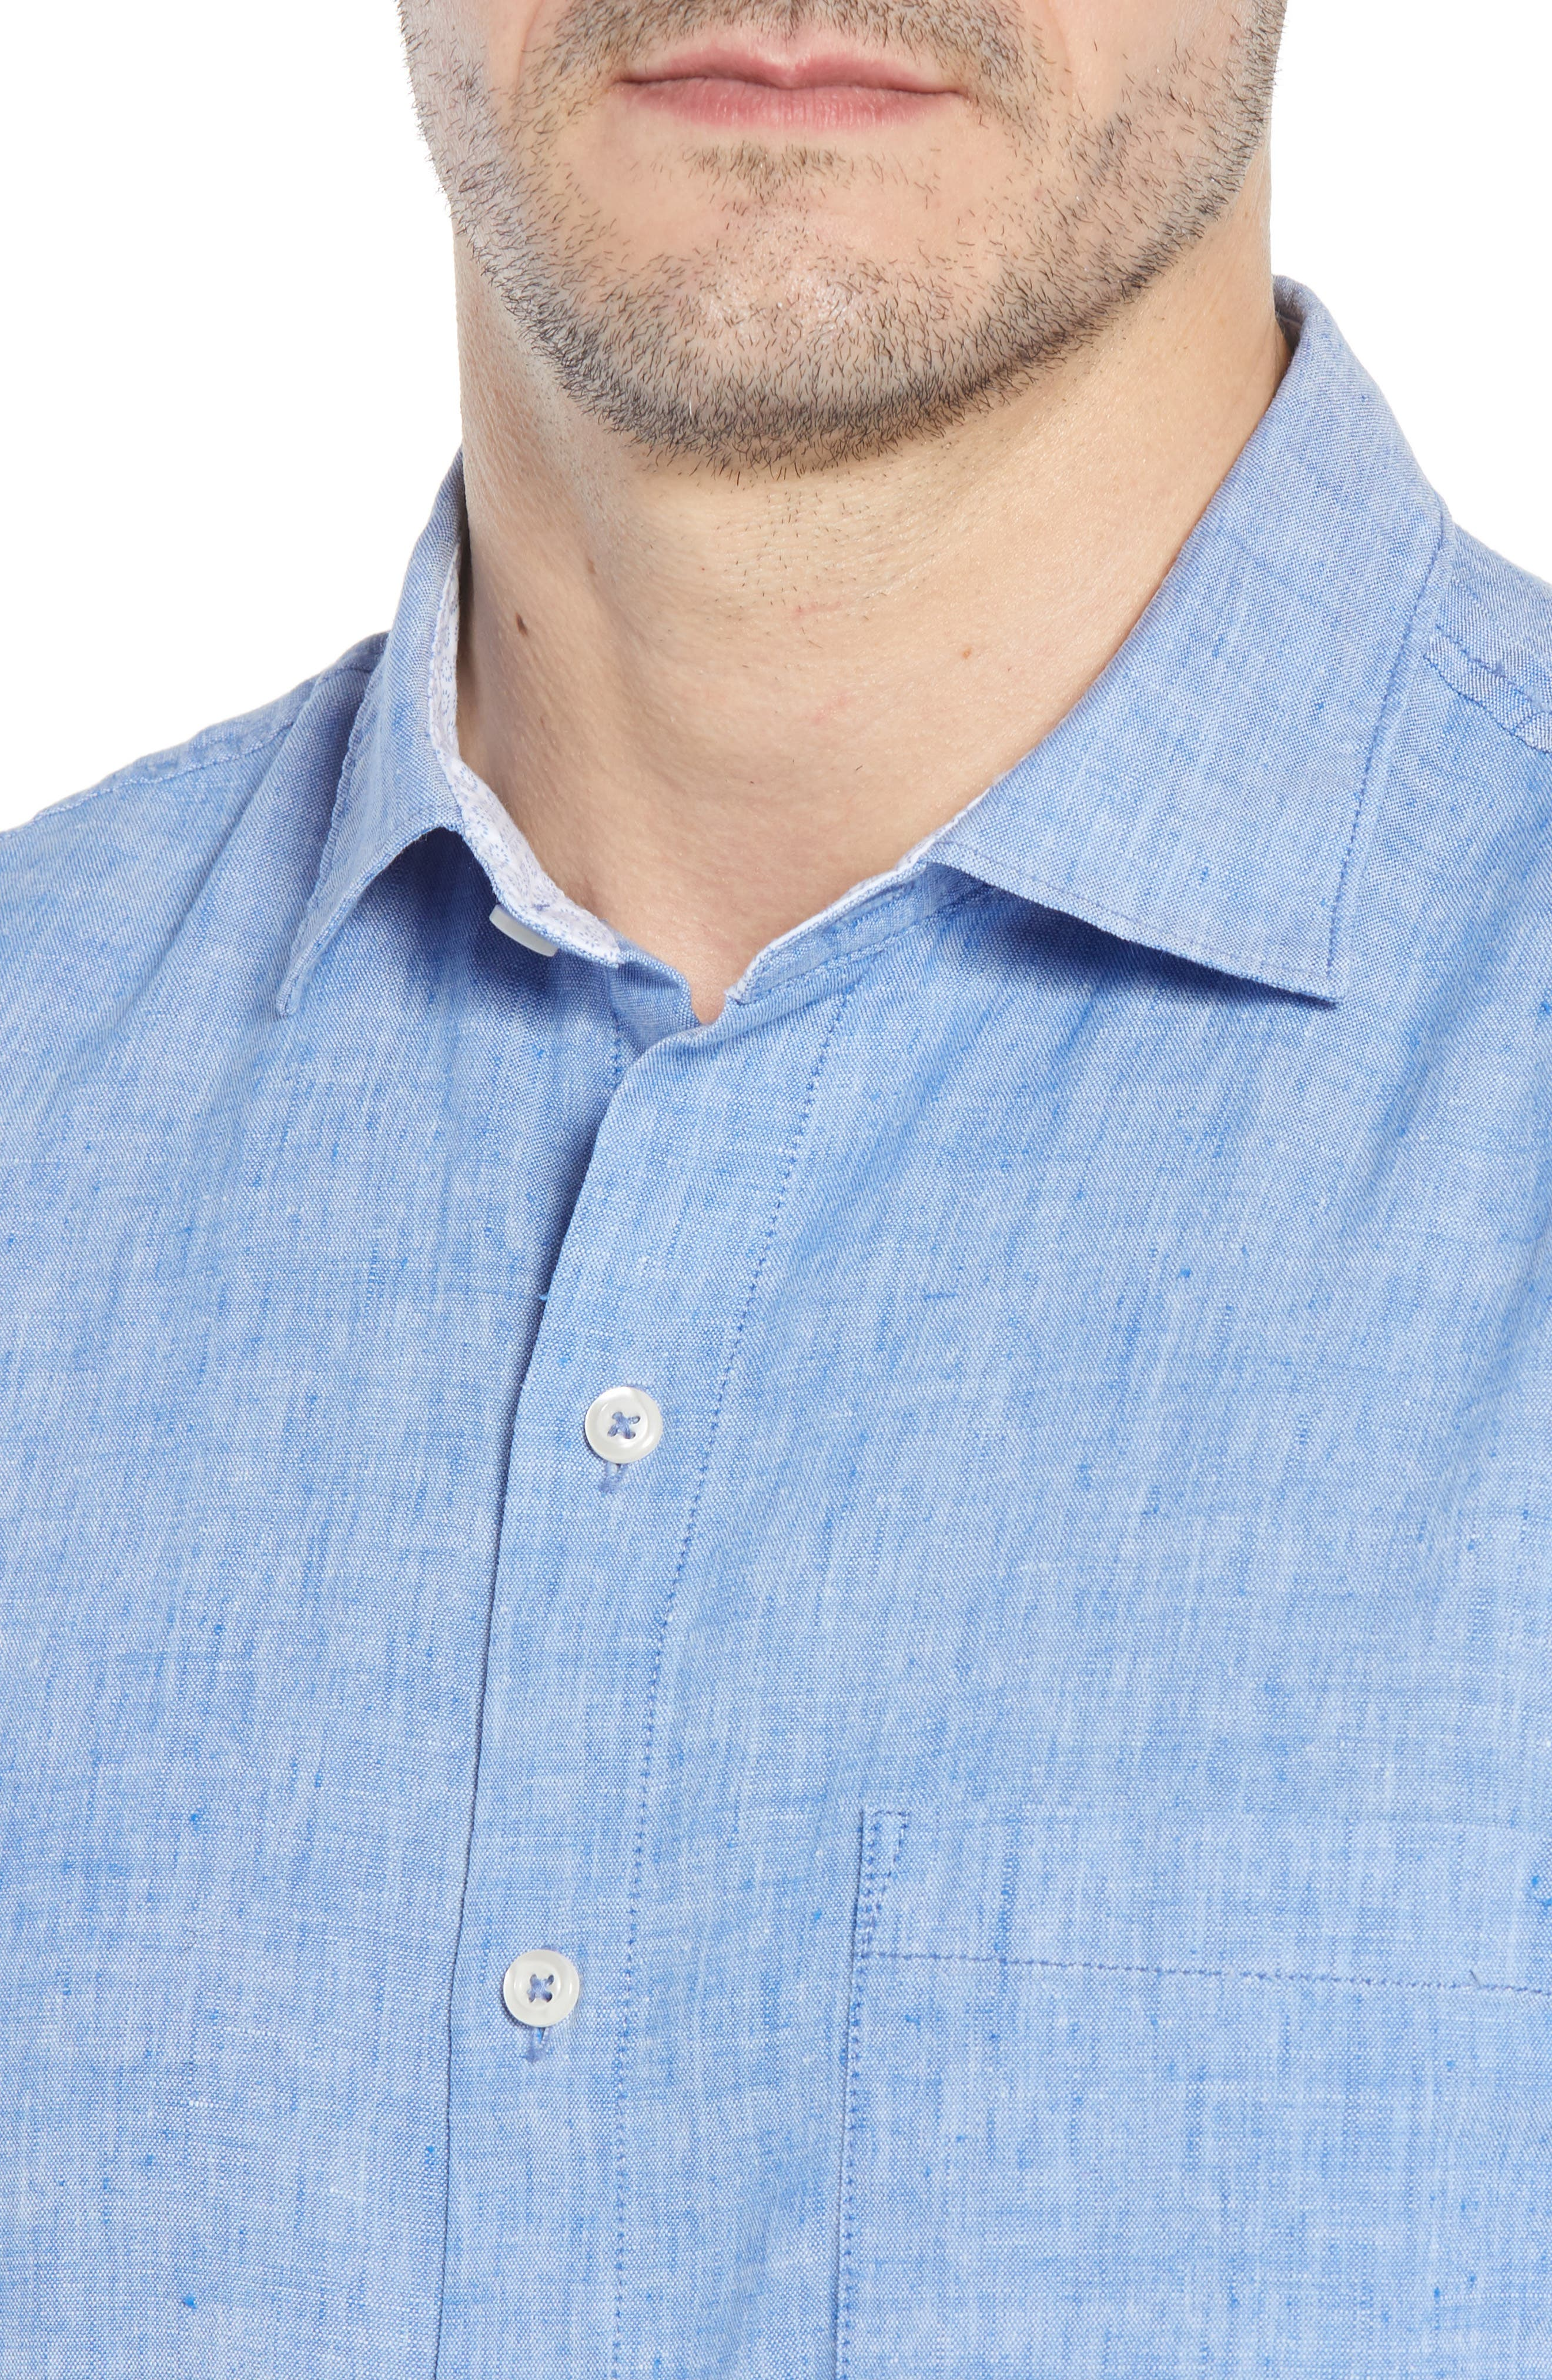 Lanai Tides Linen Blend Sport Shirt,                             Alternate thumbnail 4, color,                             Cobalt Sea